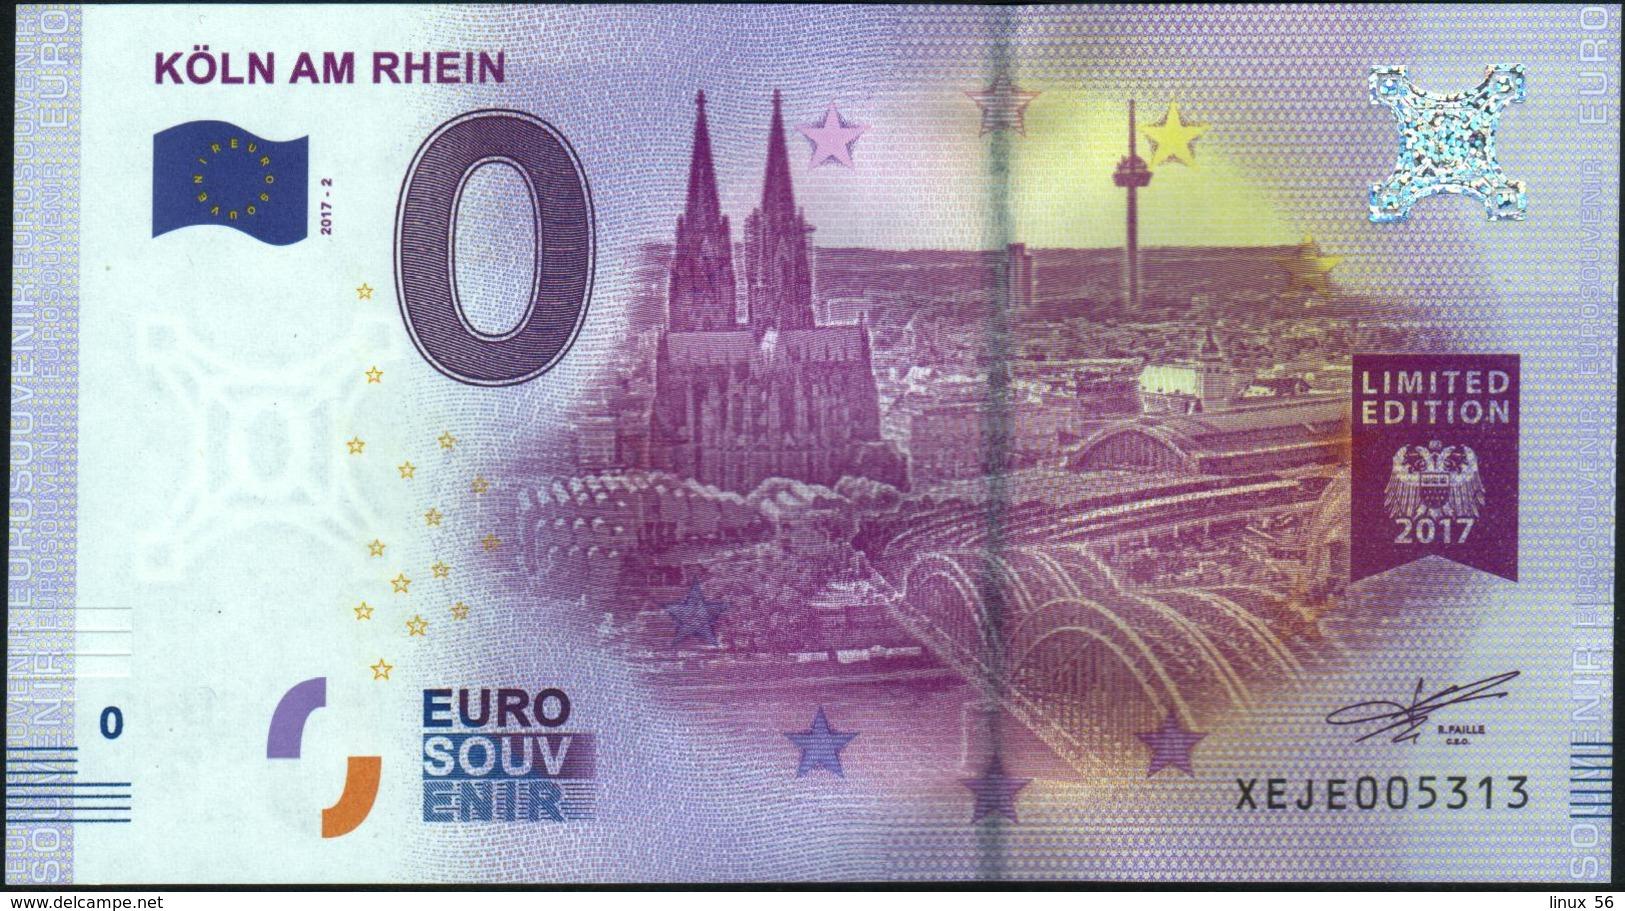 Zero - BILLET EURO O Souvenir - KOLN AM RHEIN 2017-2set UNC {Germany} - EURO